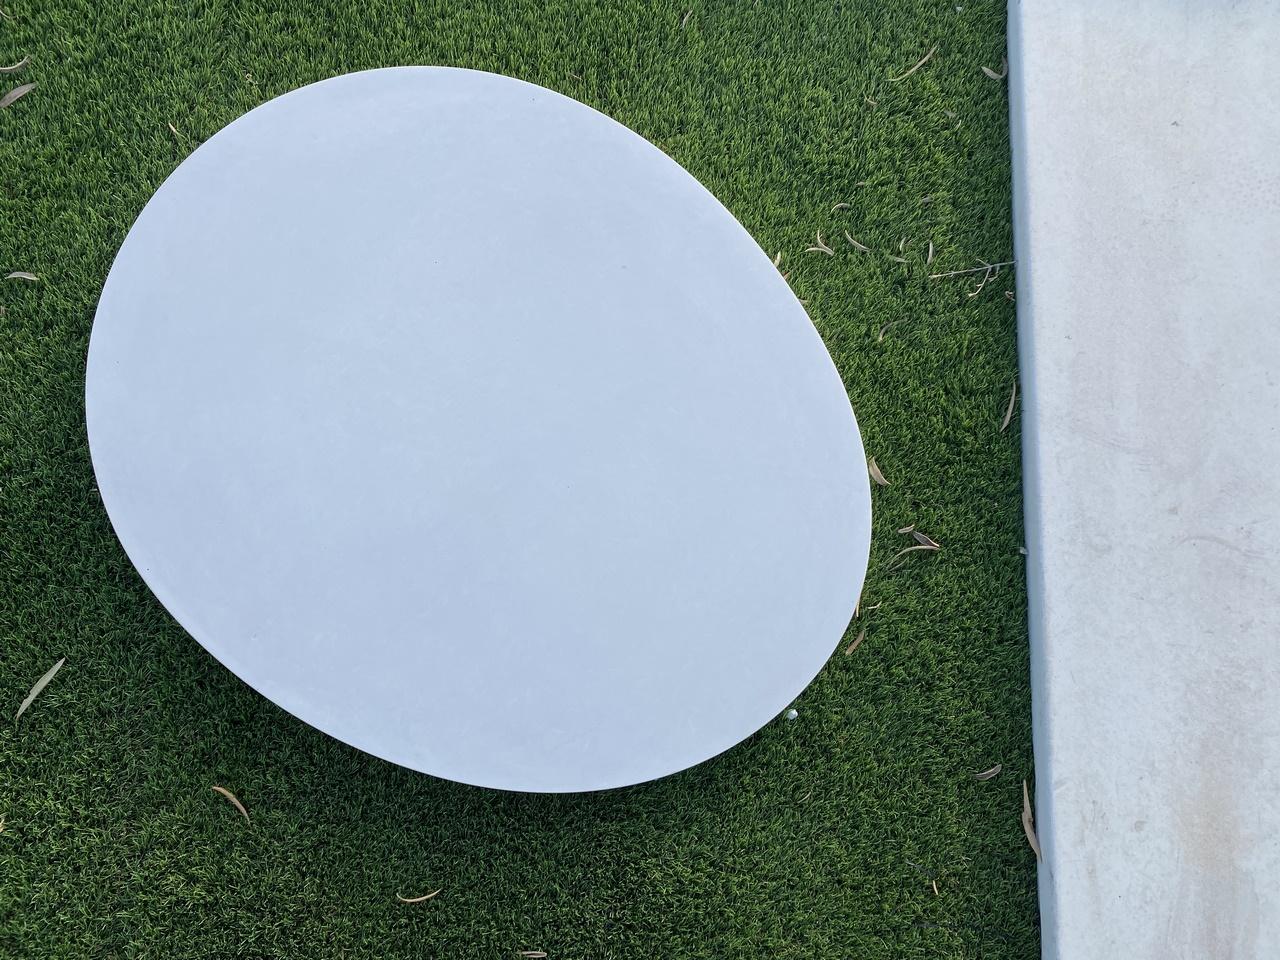 dalles-jardin-beton-pebble_1280x960 (3)